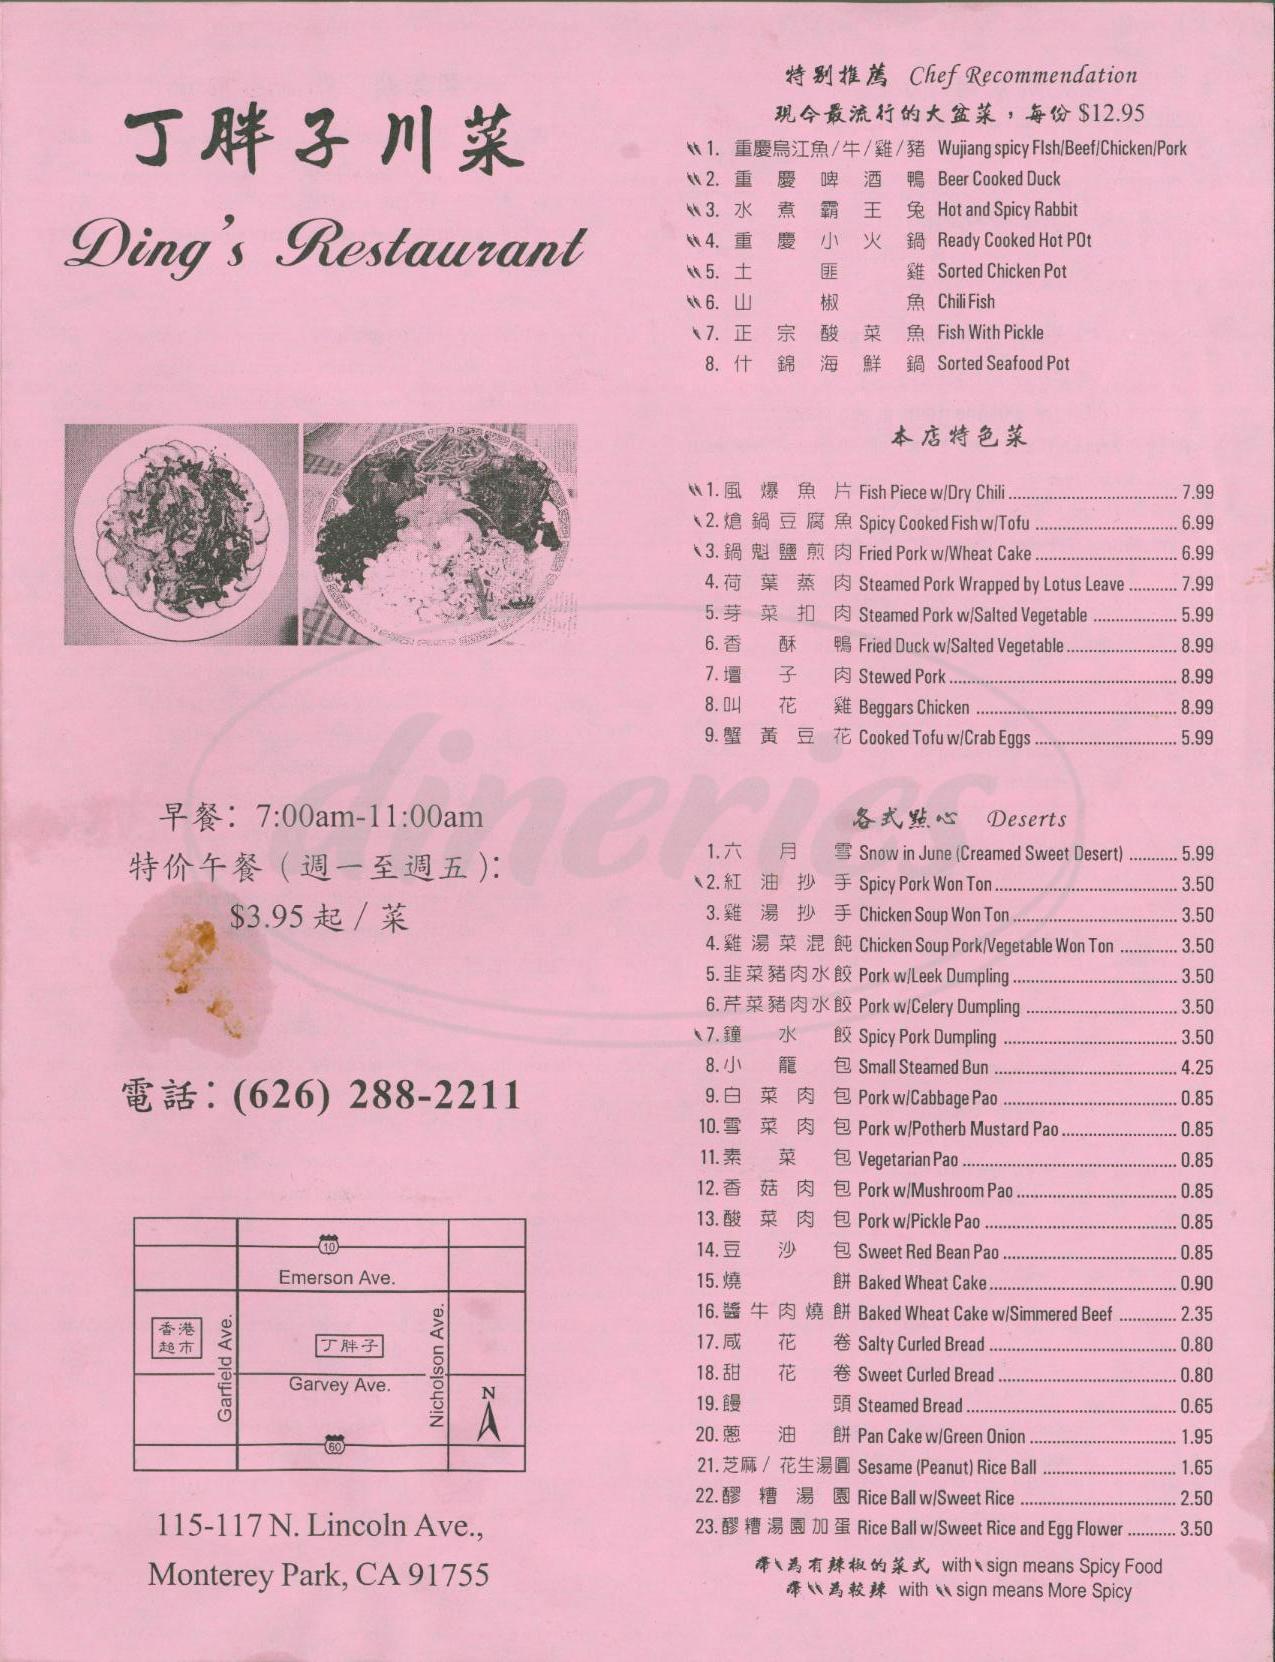 menu for Dings Restaurant